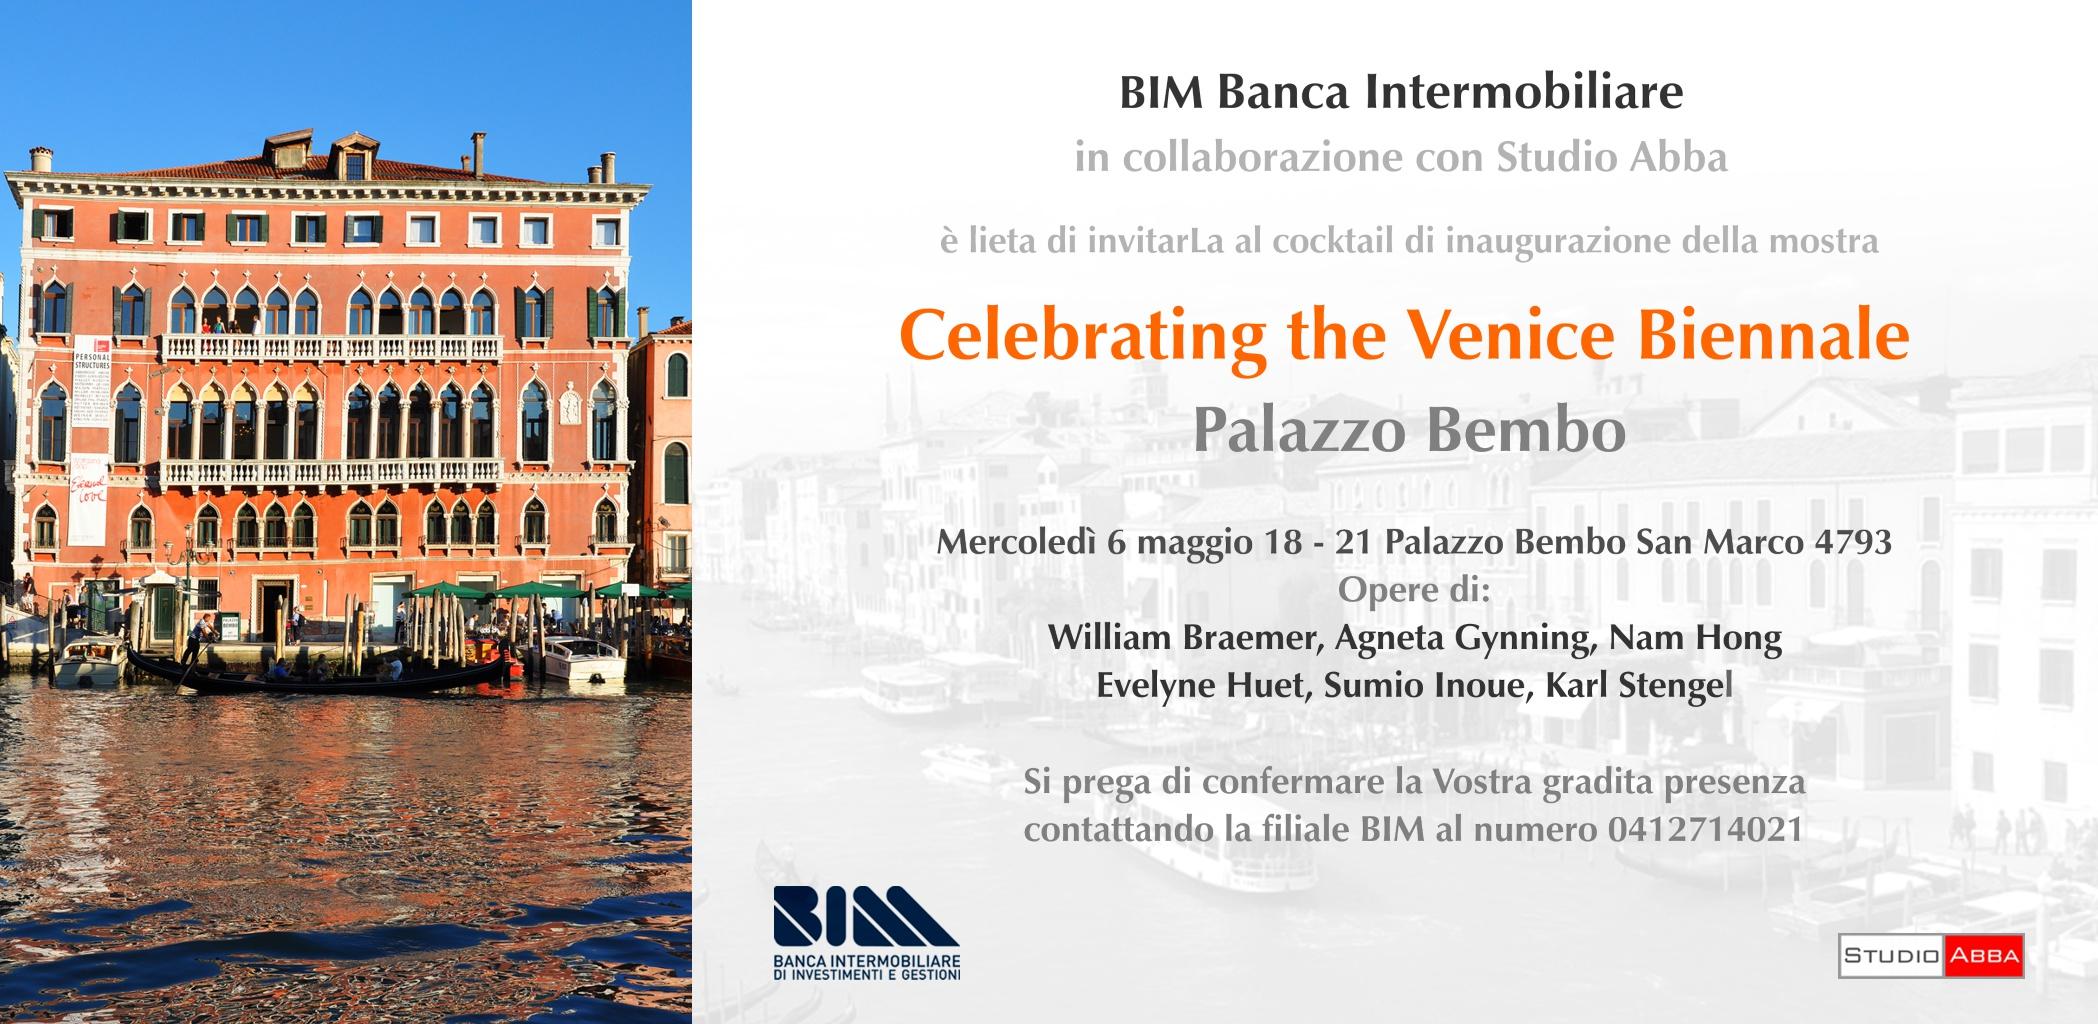 6-maggio-BIM-Studio-Abba-Palazzo-Bembo-Venezia